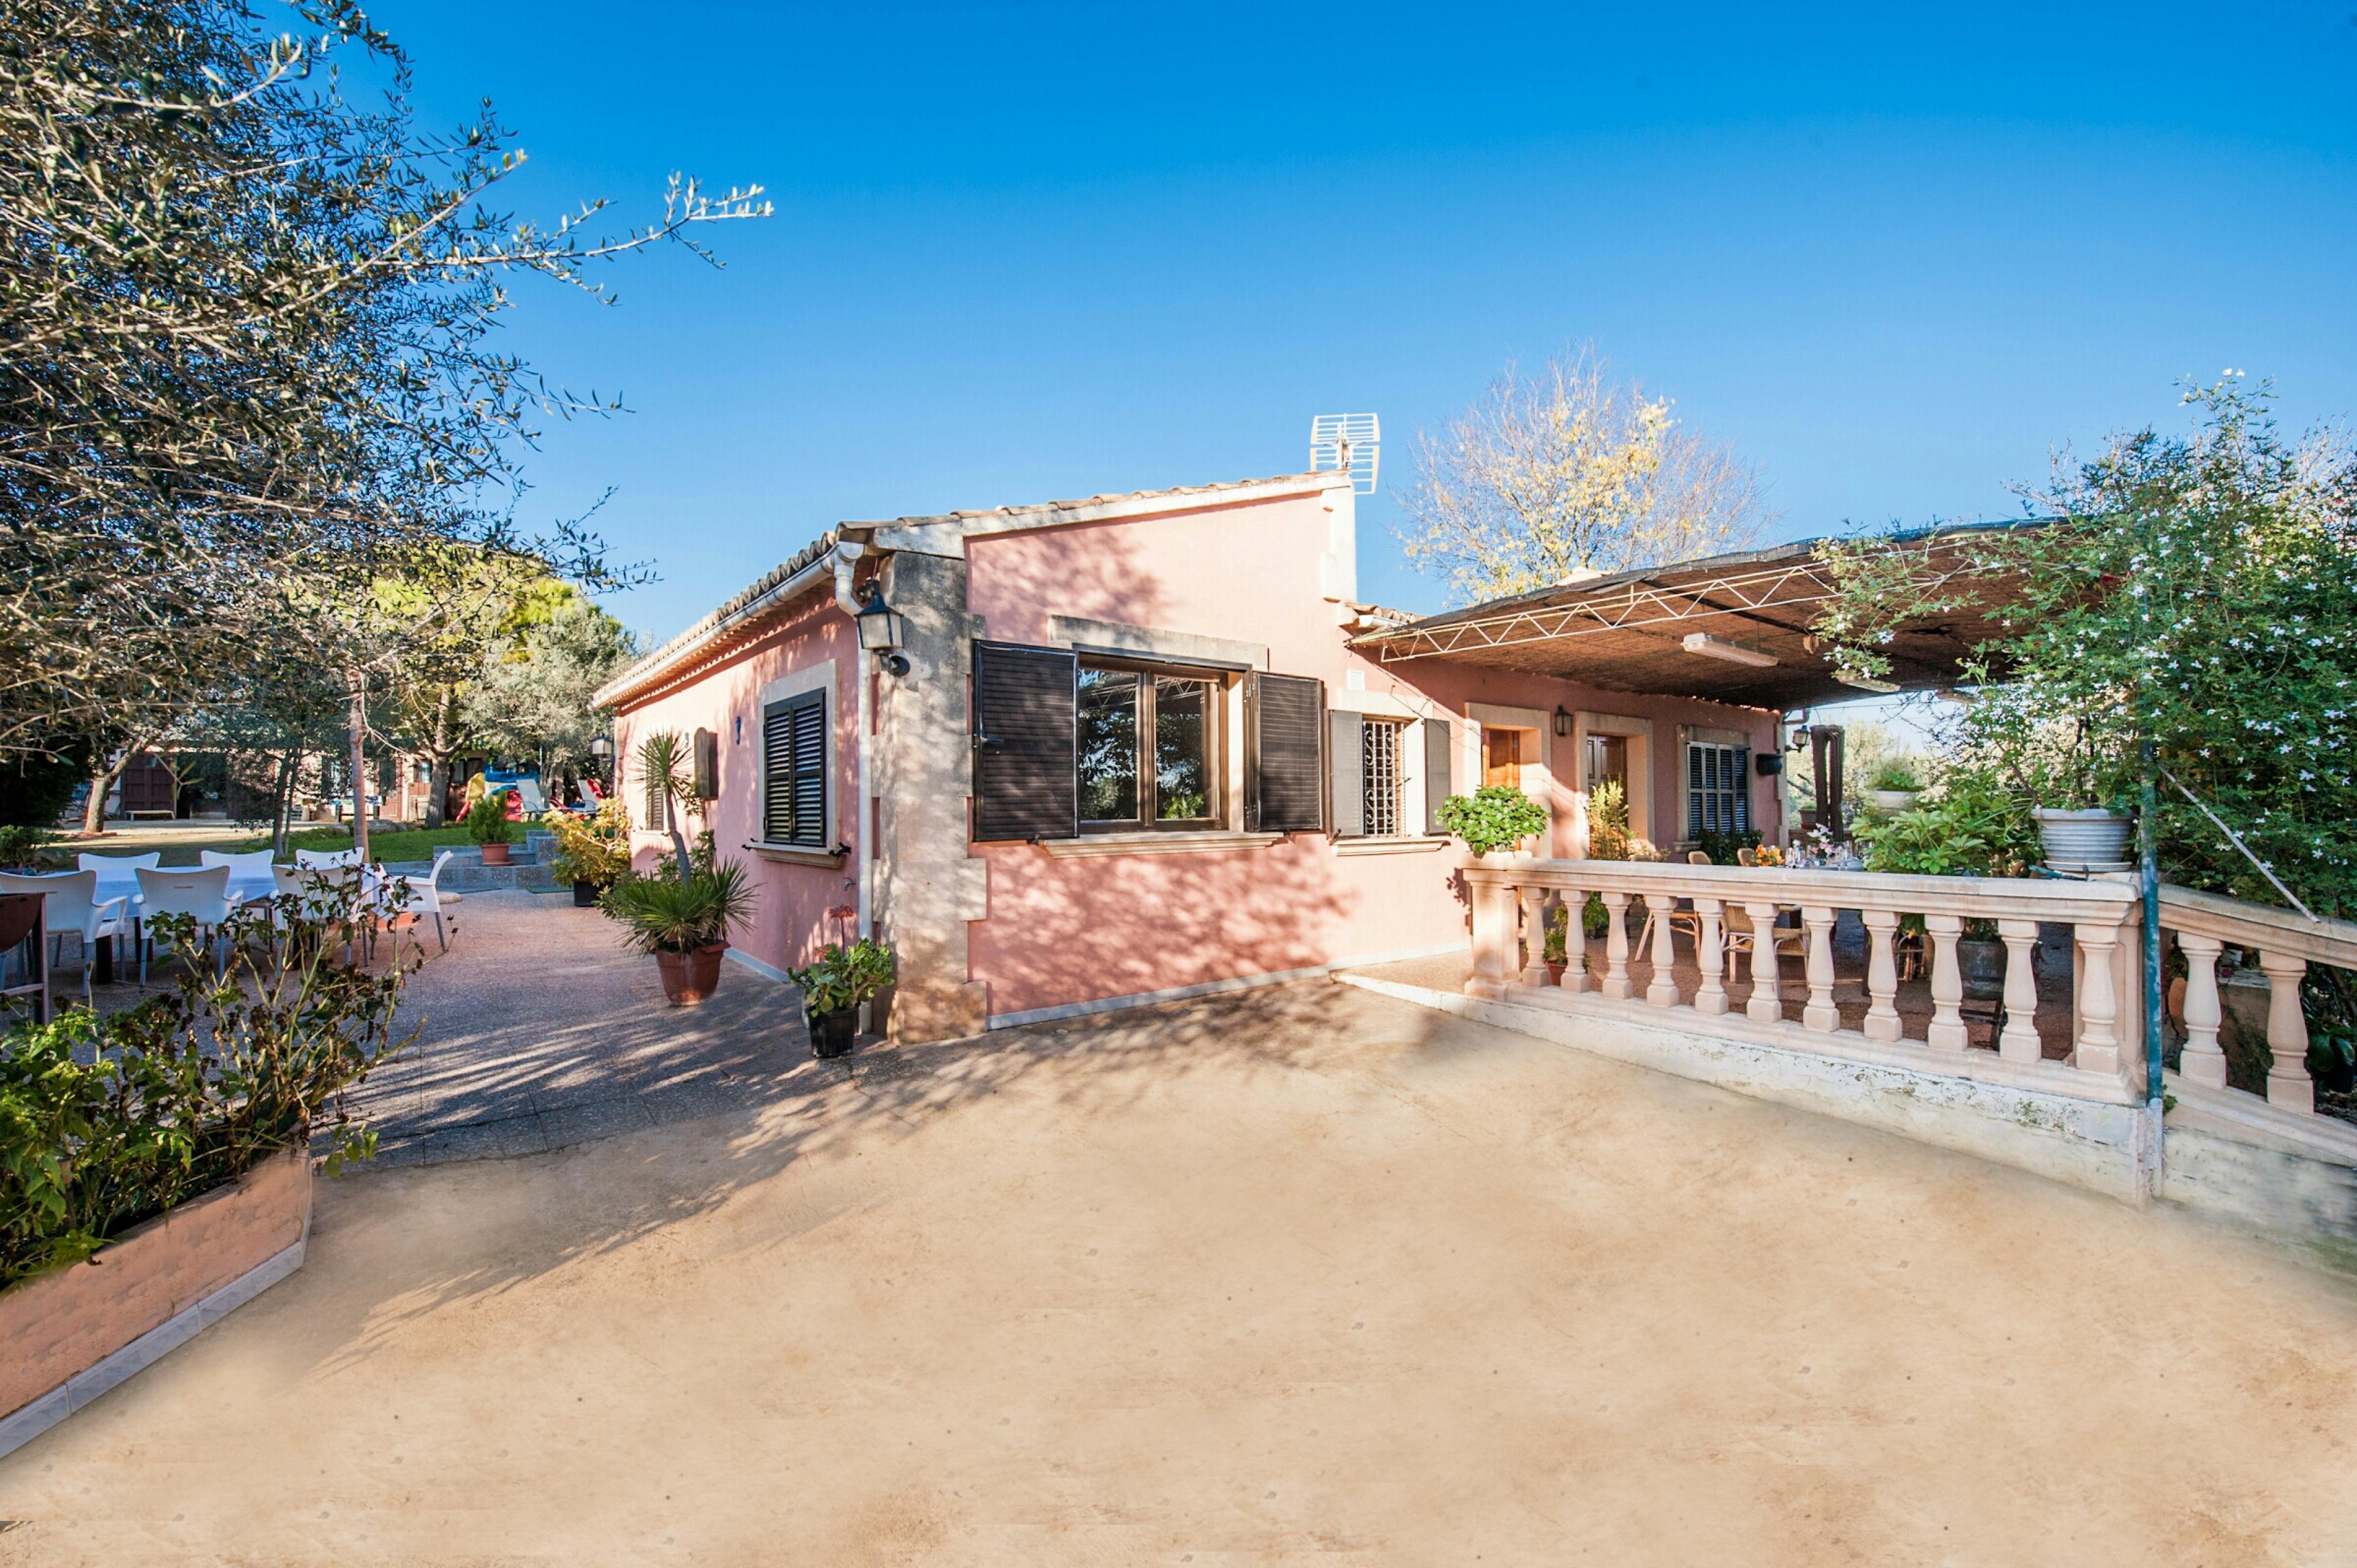 Maison de vacances CA'N LLUC- Alaró- MALLORCA - Kostenloses WLAN (2687507), Alaro, Majorque, Iles Baléares, Espagne, image 6